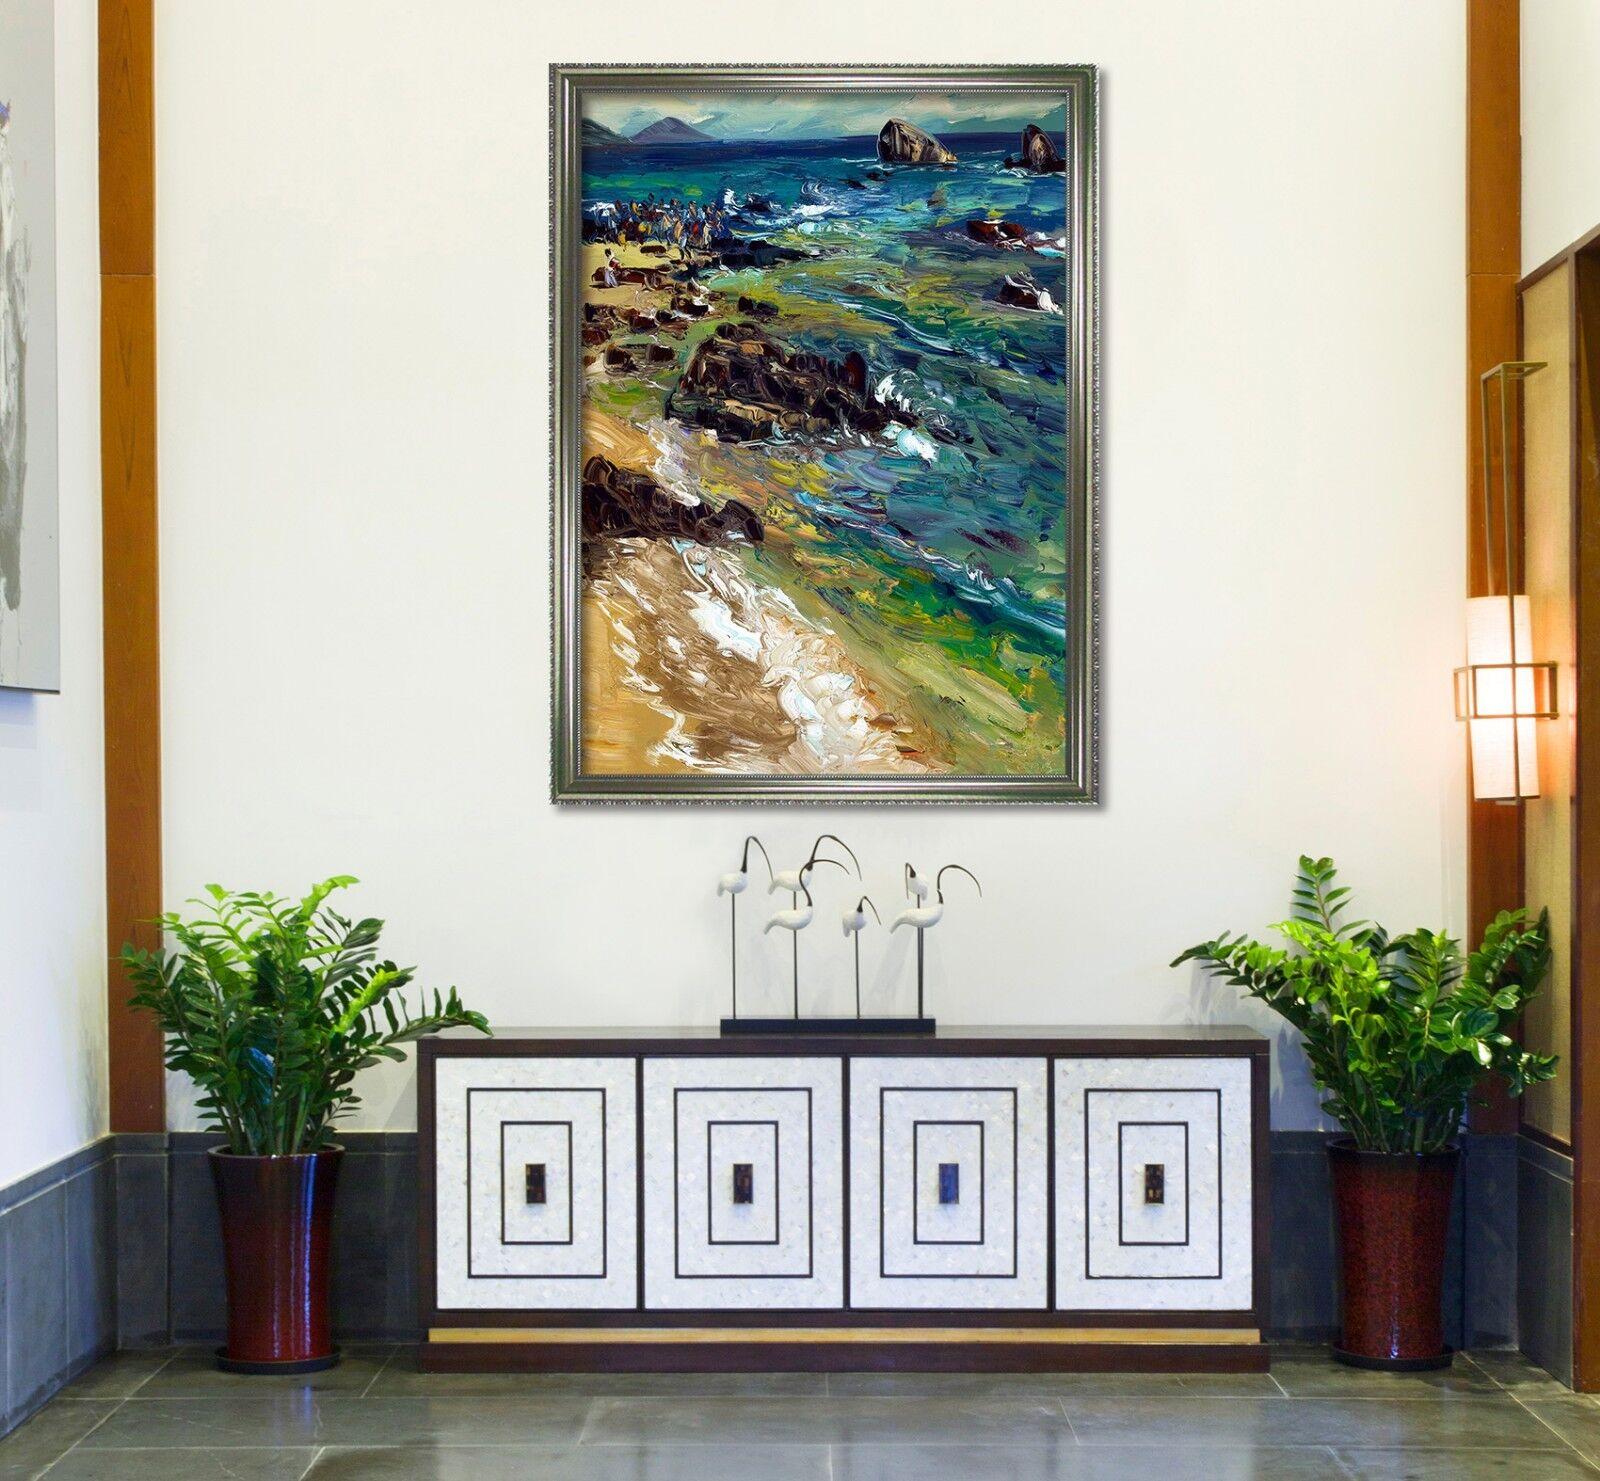 3D Oil Painting River 6 Framed Poster Home Decor Drucken Painting Kunst AJ AU